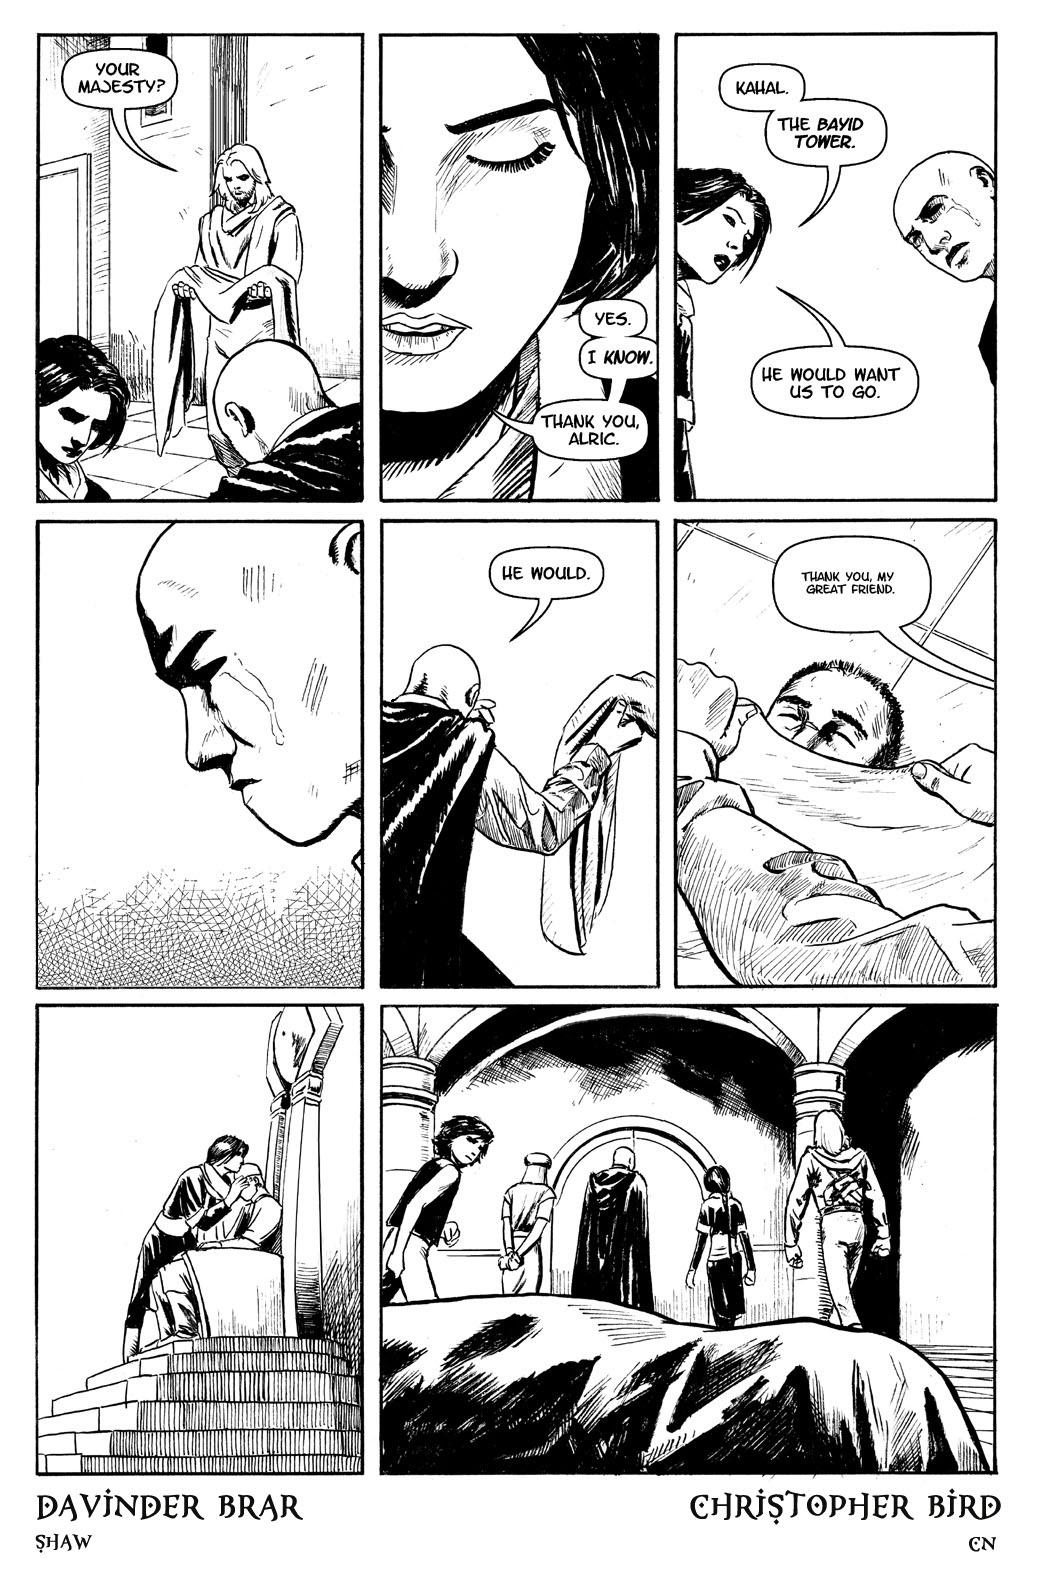 Book Six, Page Twenty-Three